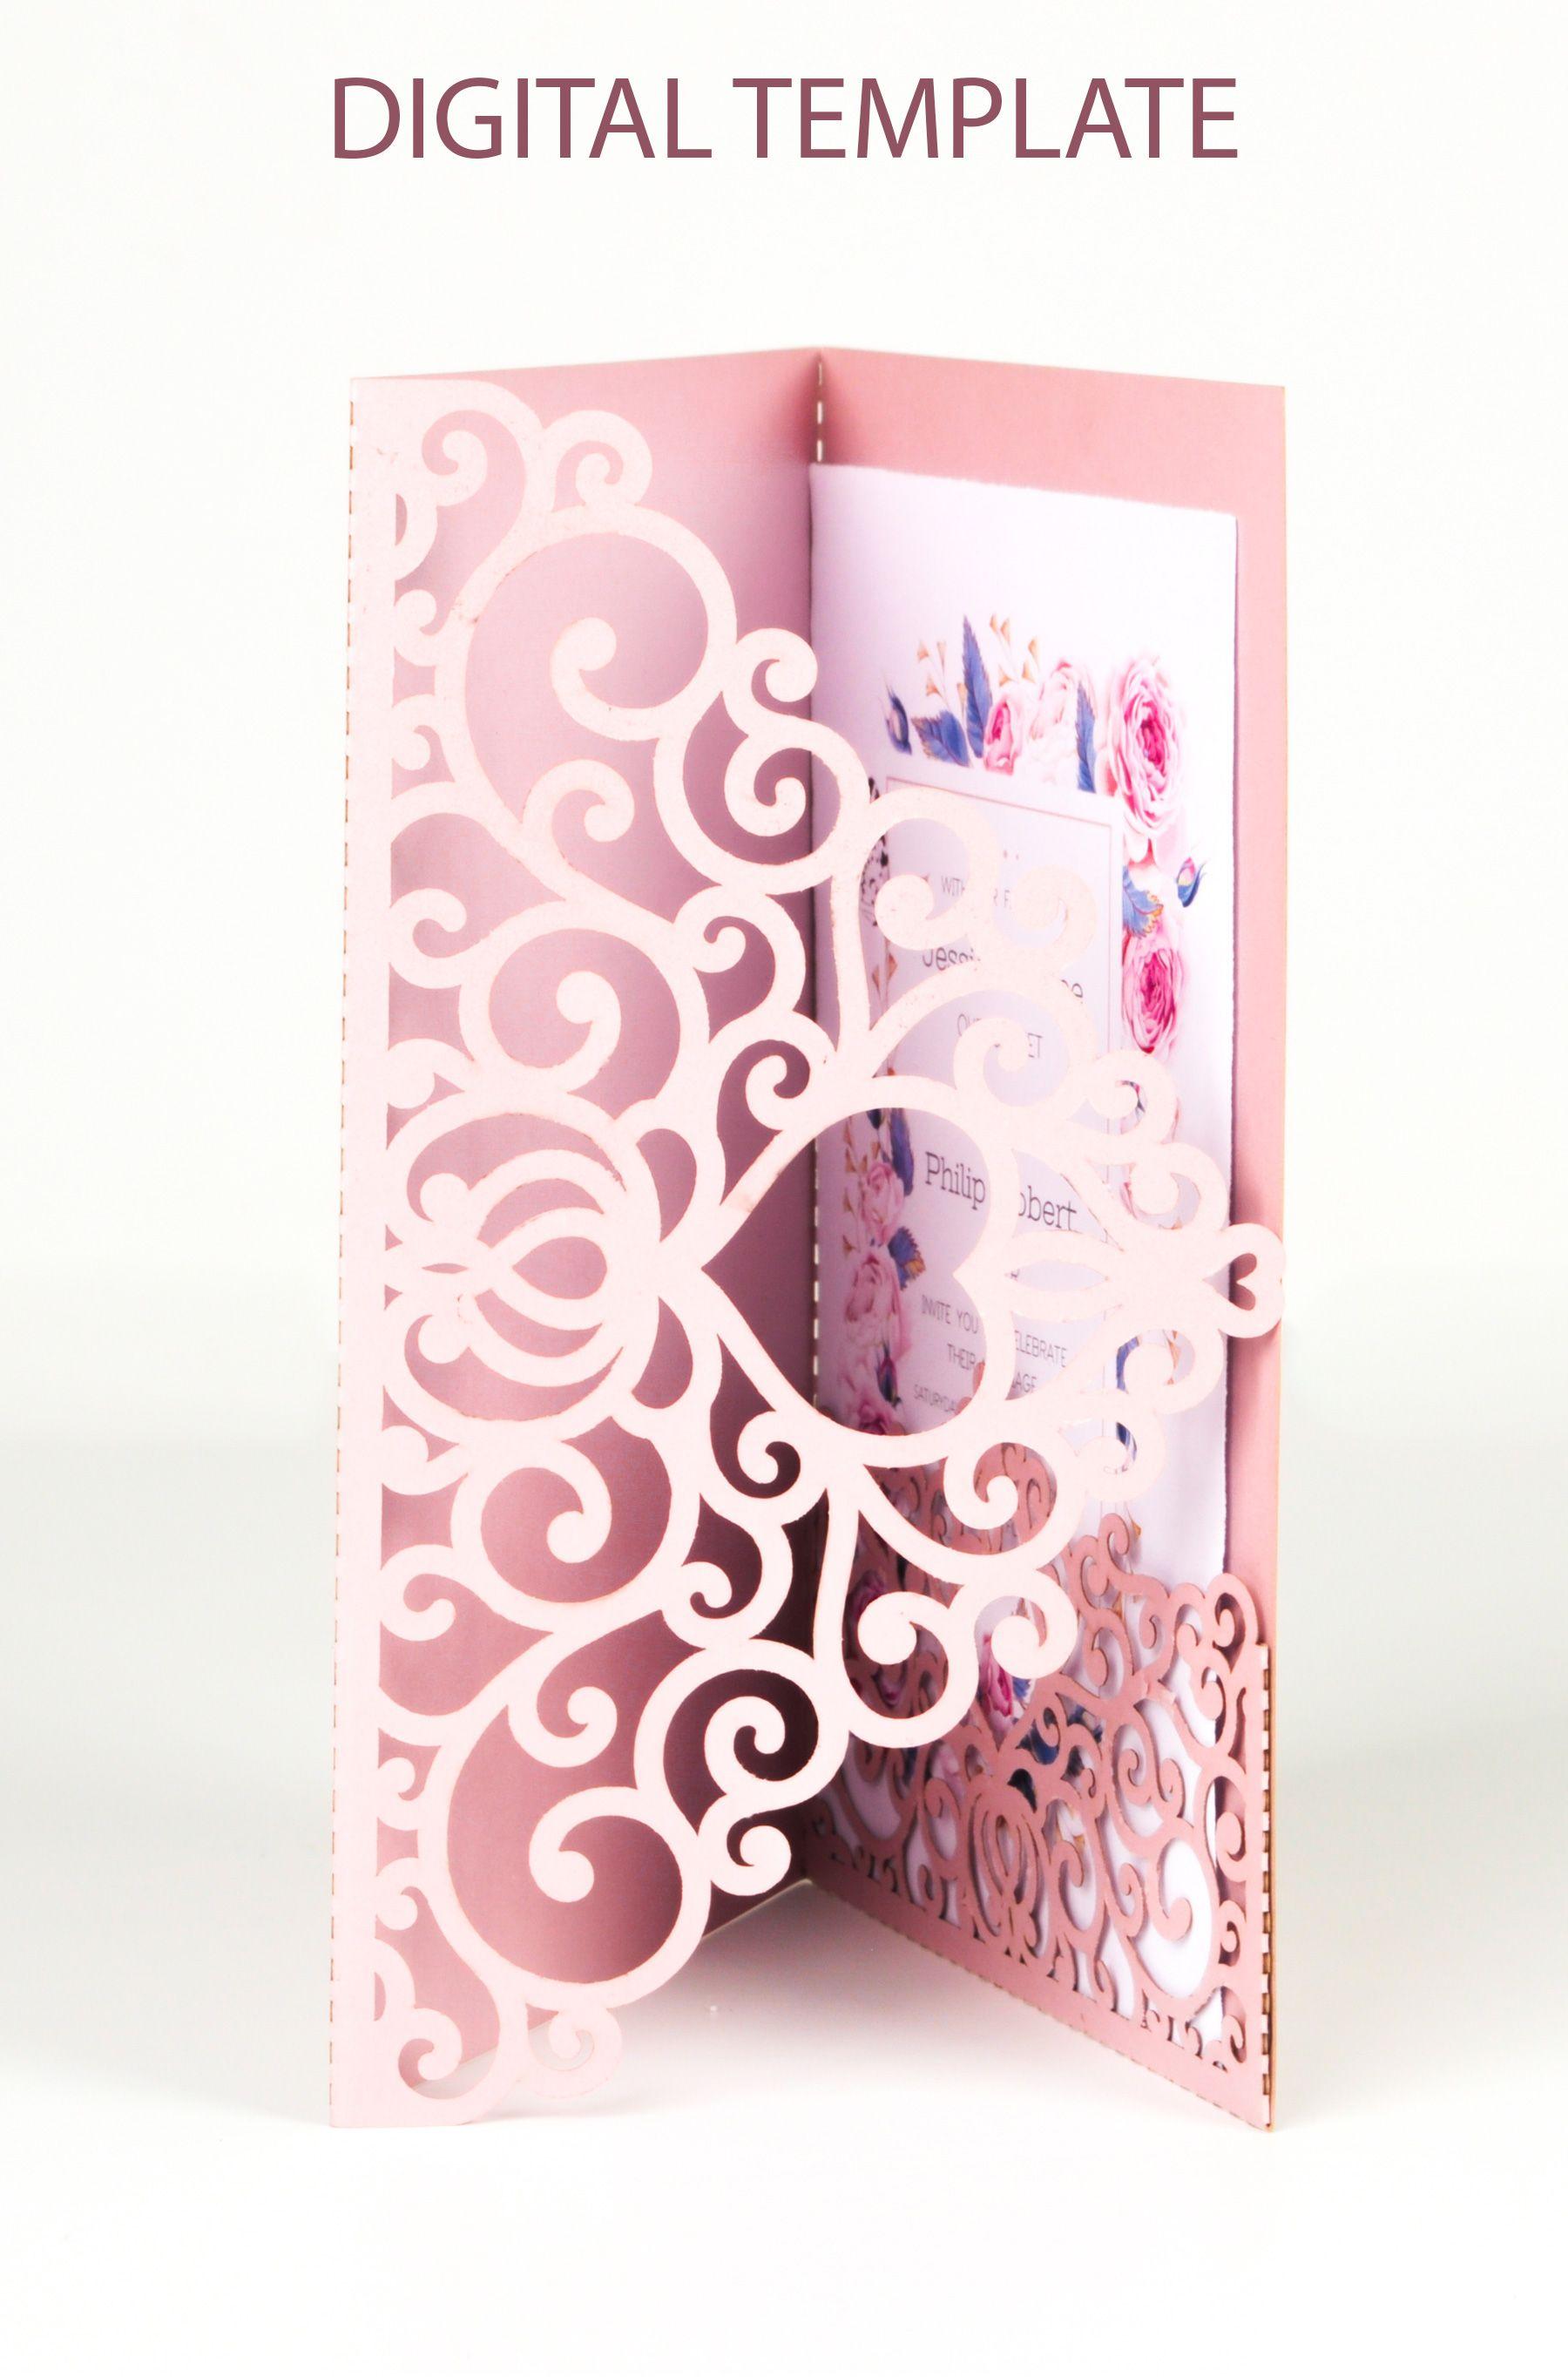 Tri Fold Wedding Invitation Pocket Envelope Svg Template 5x7 Etsy In 2020 Tri Fold Wedding Invitations Pocket Wedding Invitations Wedding Invitation Card Design